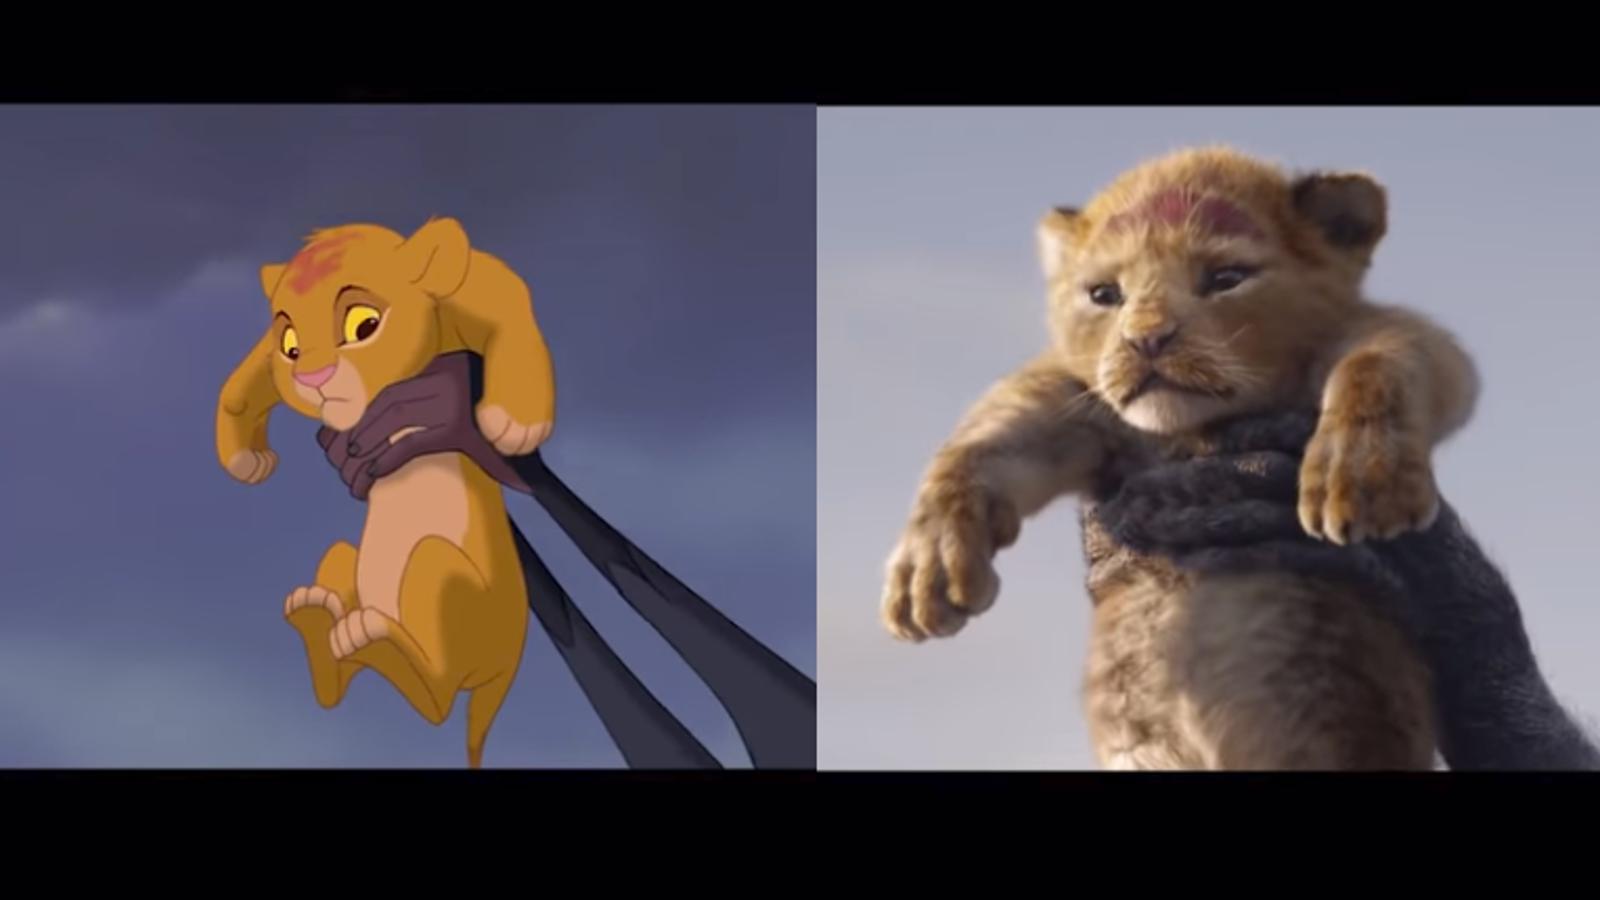 Jon Favreau S Cgi Lion King Movie Is Drab As Hell When